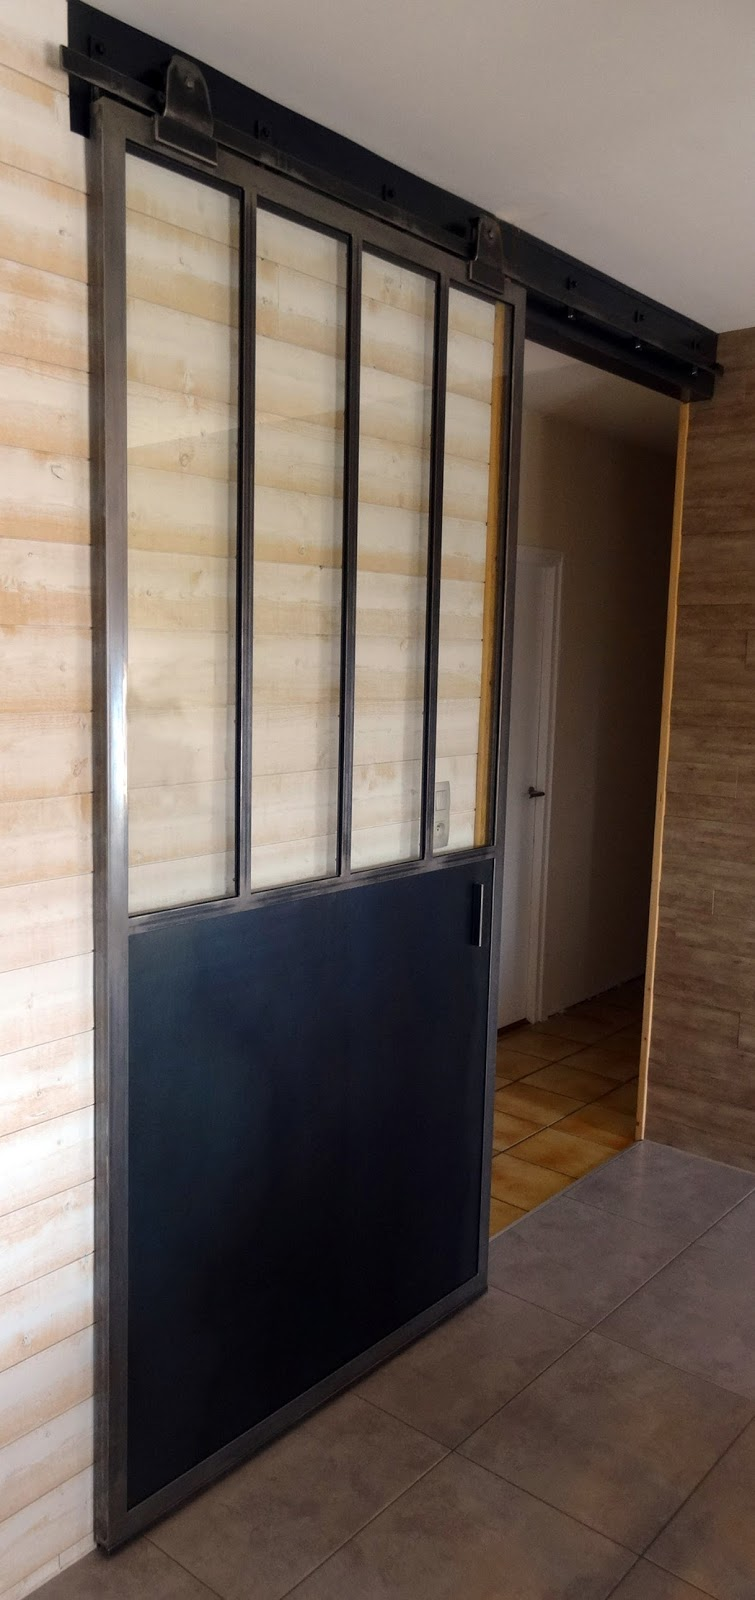 ferronnerie mtallerie serrurerie deuxsvres lart du ferplay ensem ue petite porte placard en tole. Black Bedroom Furniture Sets. Home Design Ideas